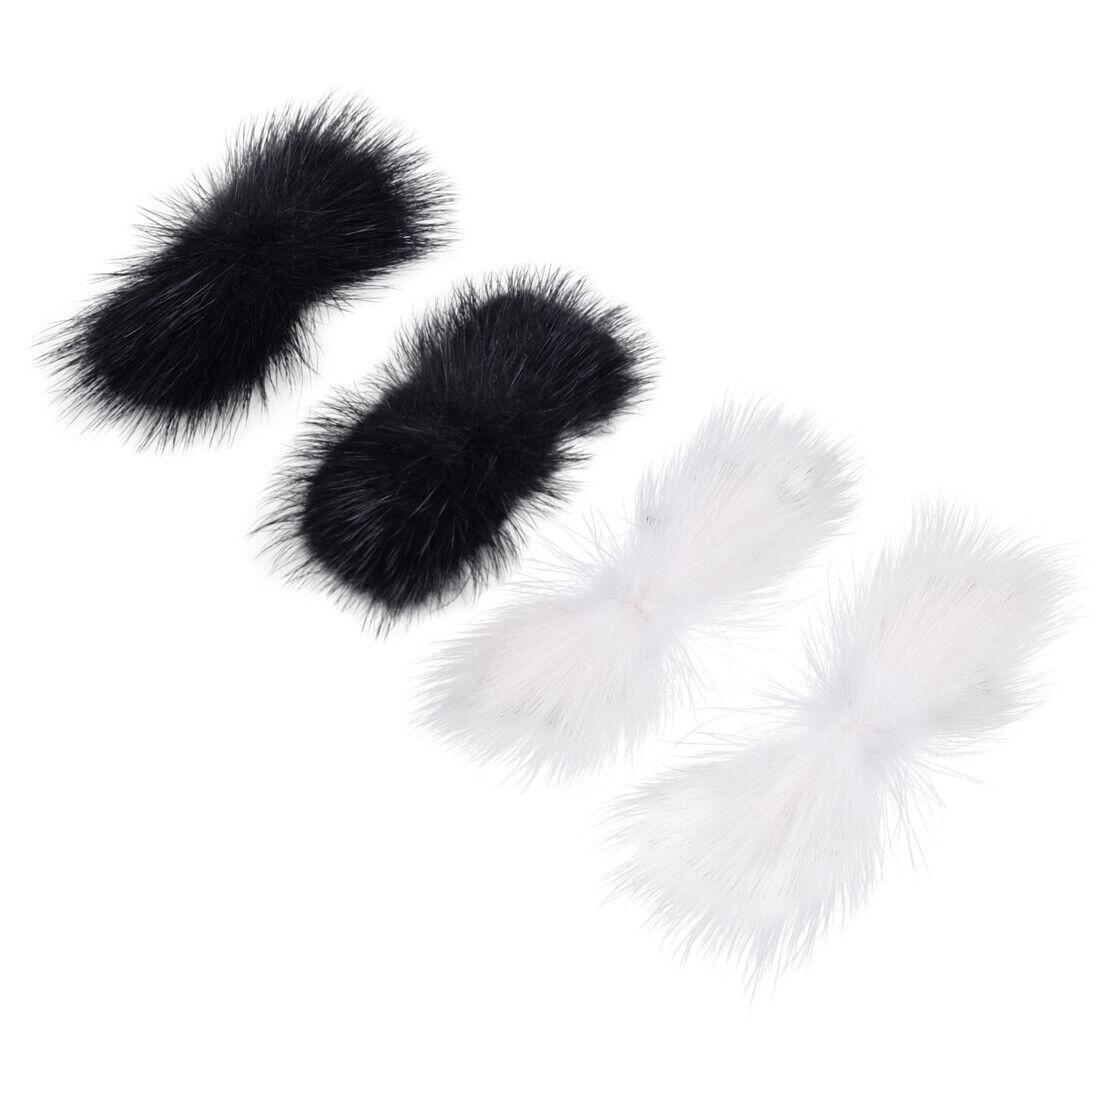 Pair Mink Fur Hair Pom Pom Shoe Clips Bow Fluffy Ornament Heels Charm DIY 8*3cm